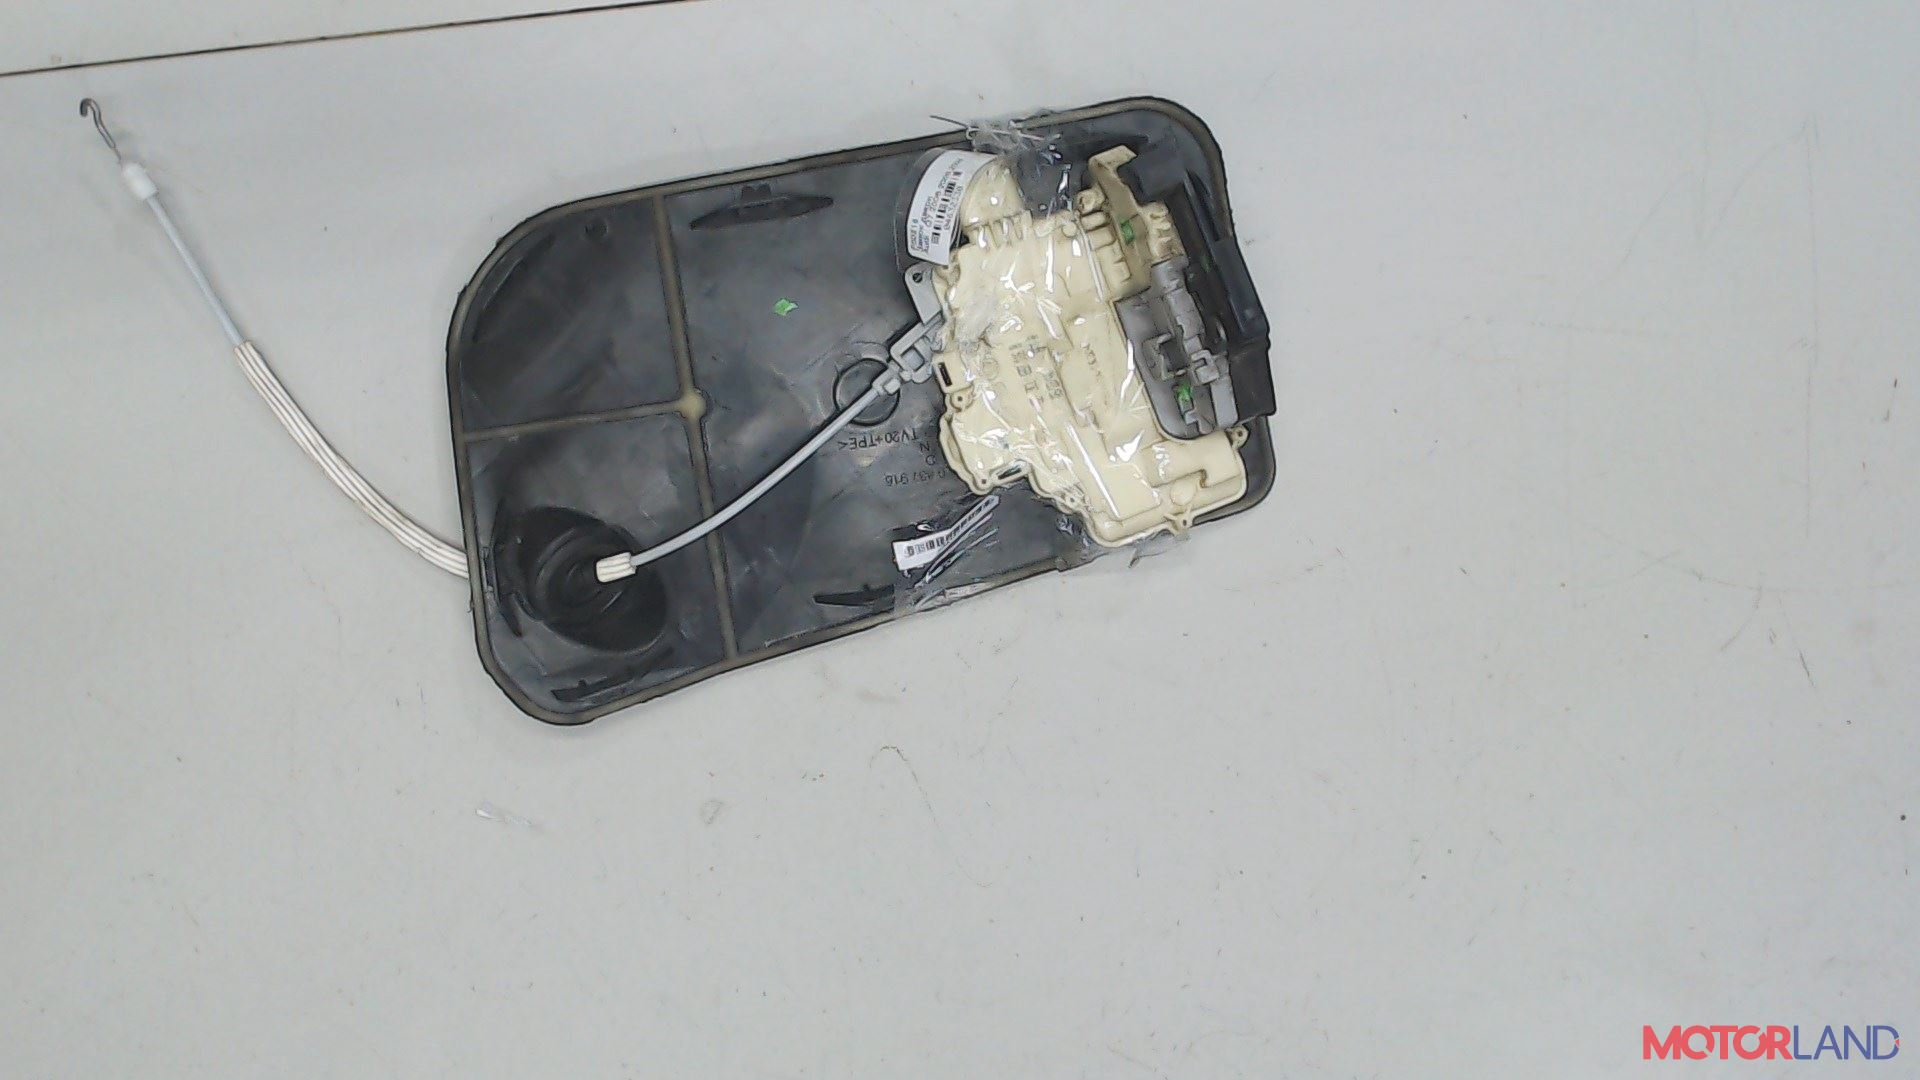 Замок двери Audi Q7 2006-2009 4.2 л. 2006 BAR б/у #3